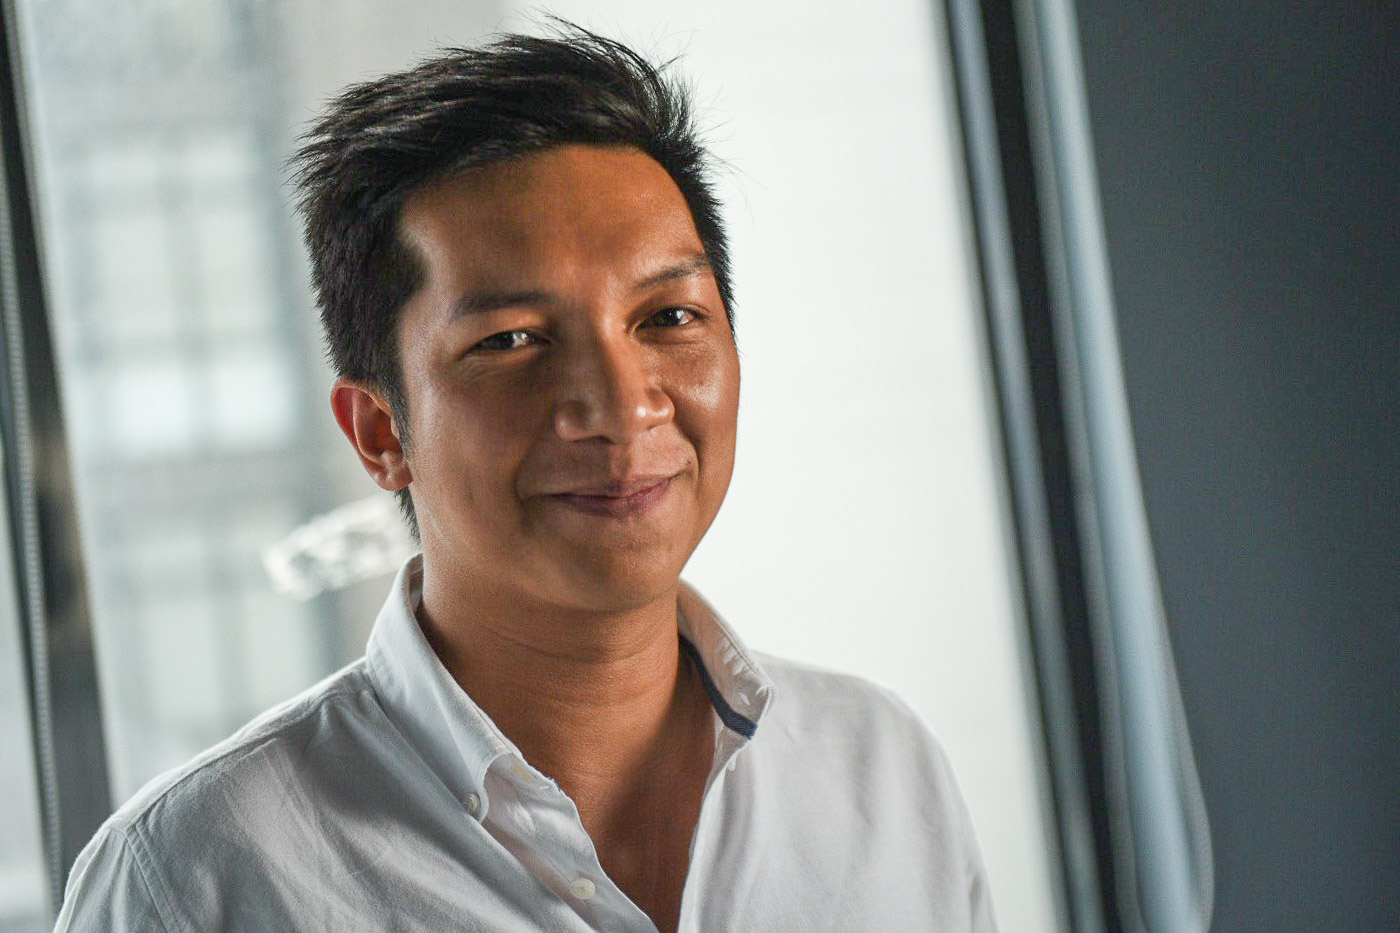 Quanta Digital's digital director, Sydney Dondon